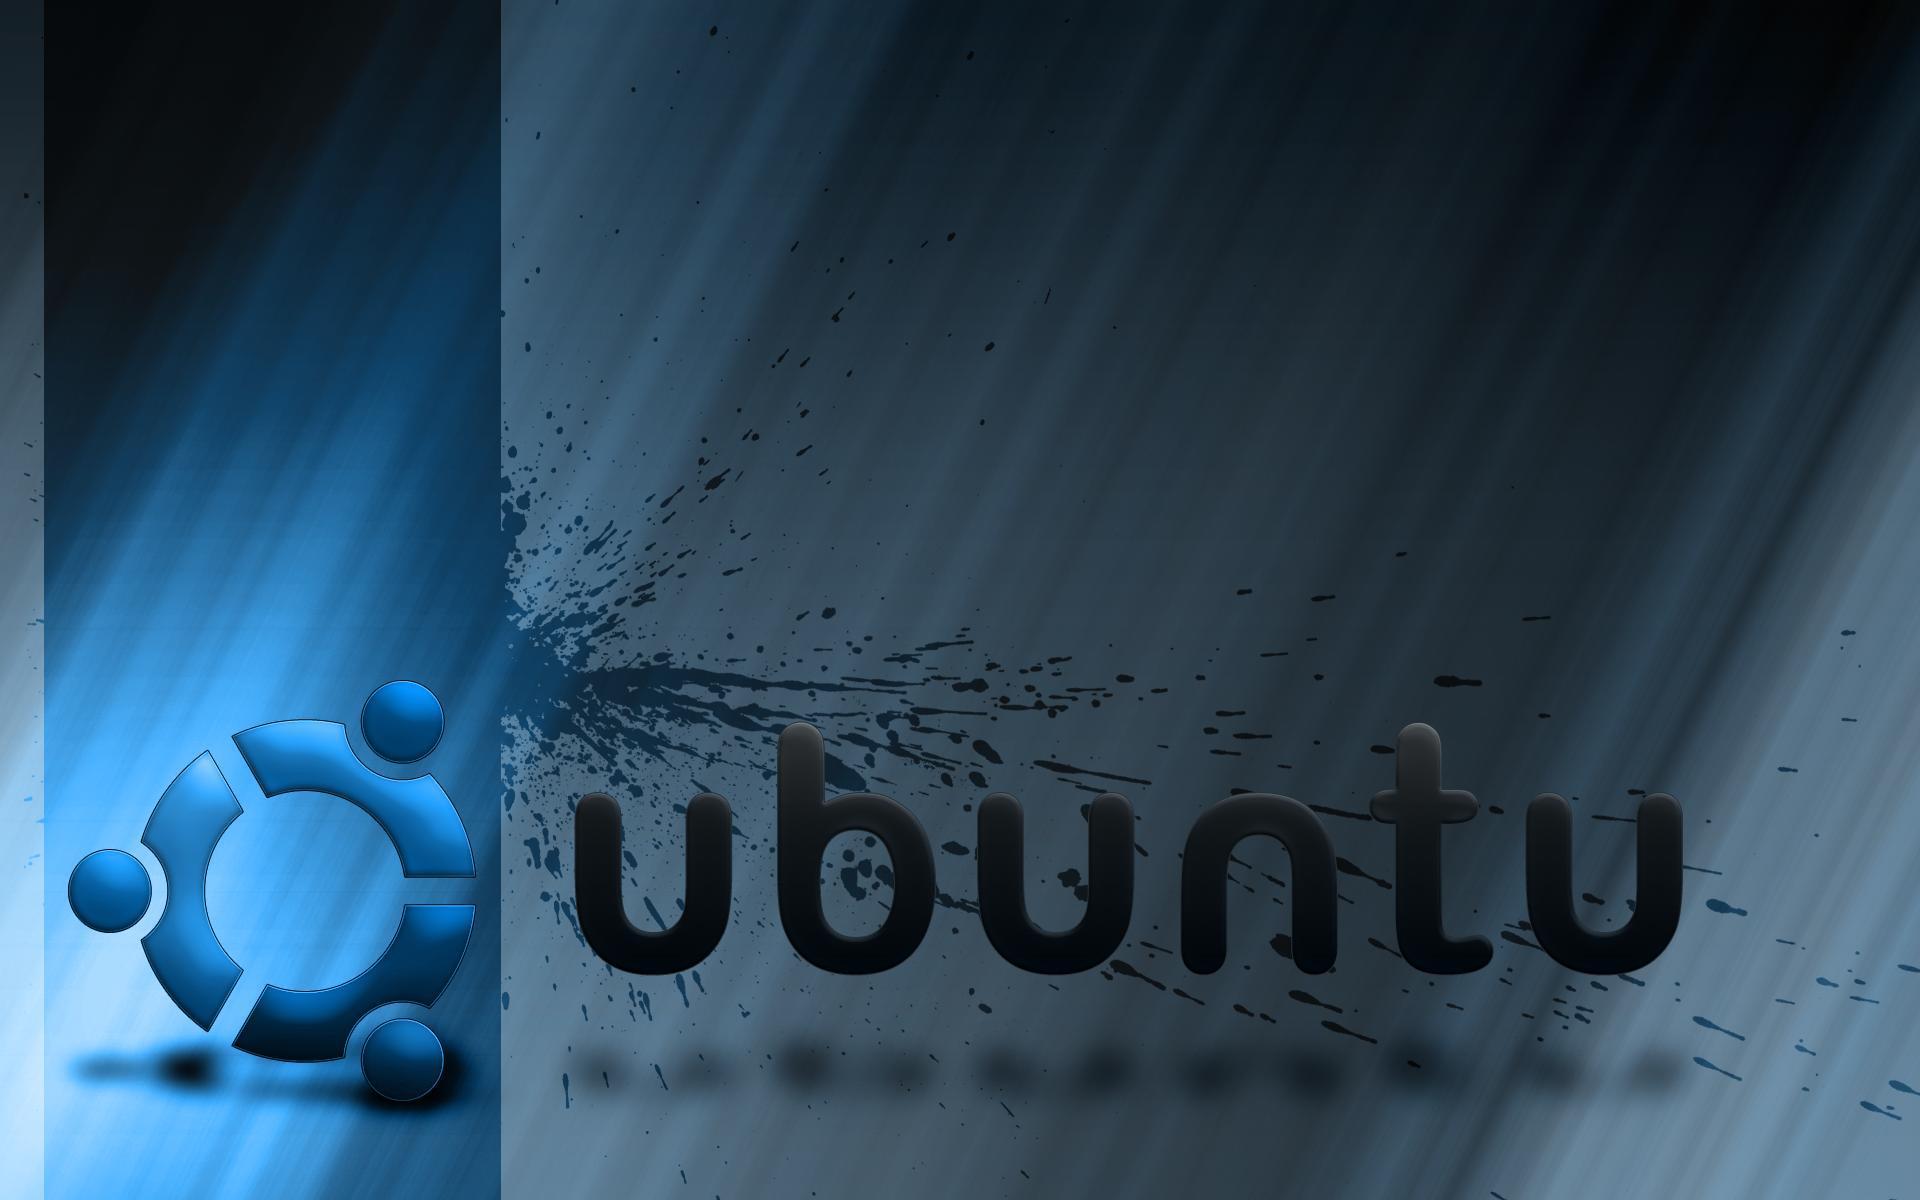 Ubuntu Wallpaper - Full HD wallpaper search - page 29